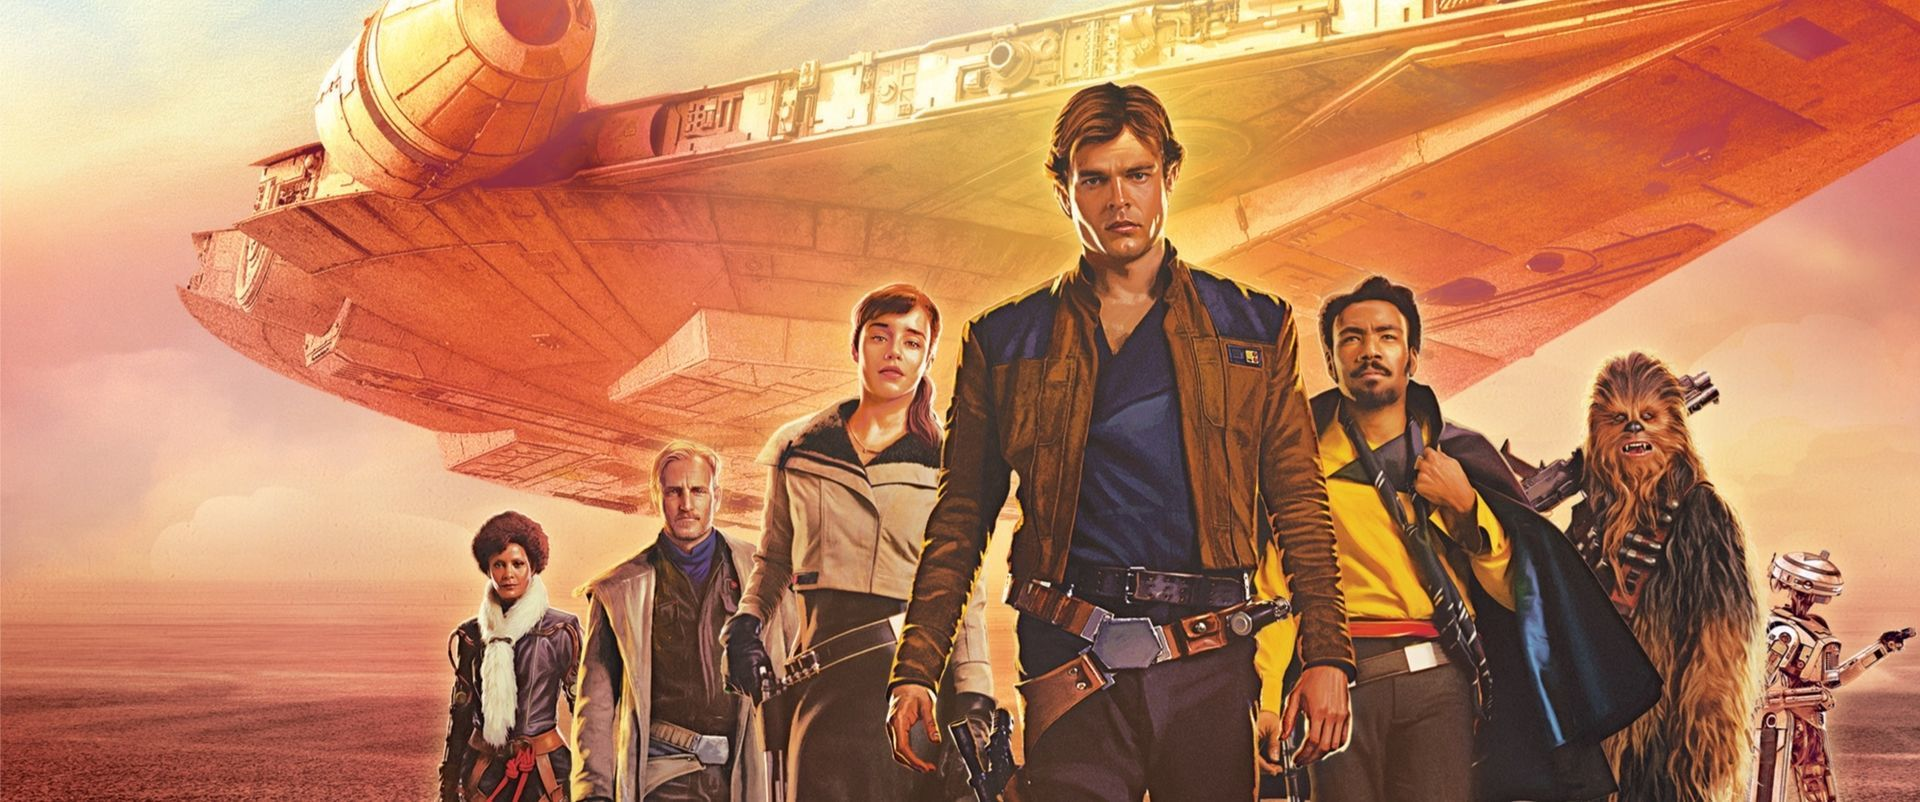 Solo A Star Wars Story Han Solo Chewbacca Chewie Spin-off Disney Test Kritik Heimkino Blu ray DVD Titel